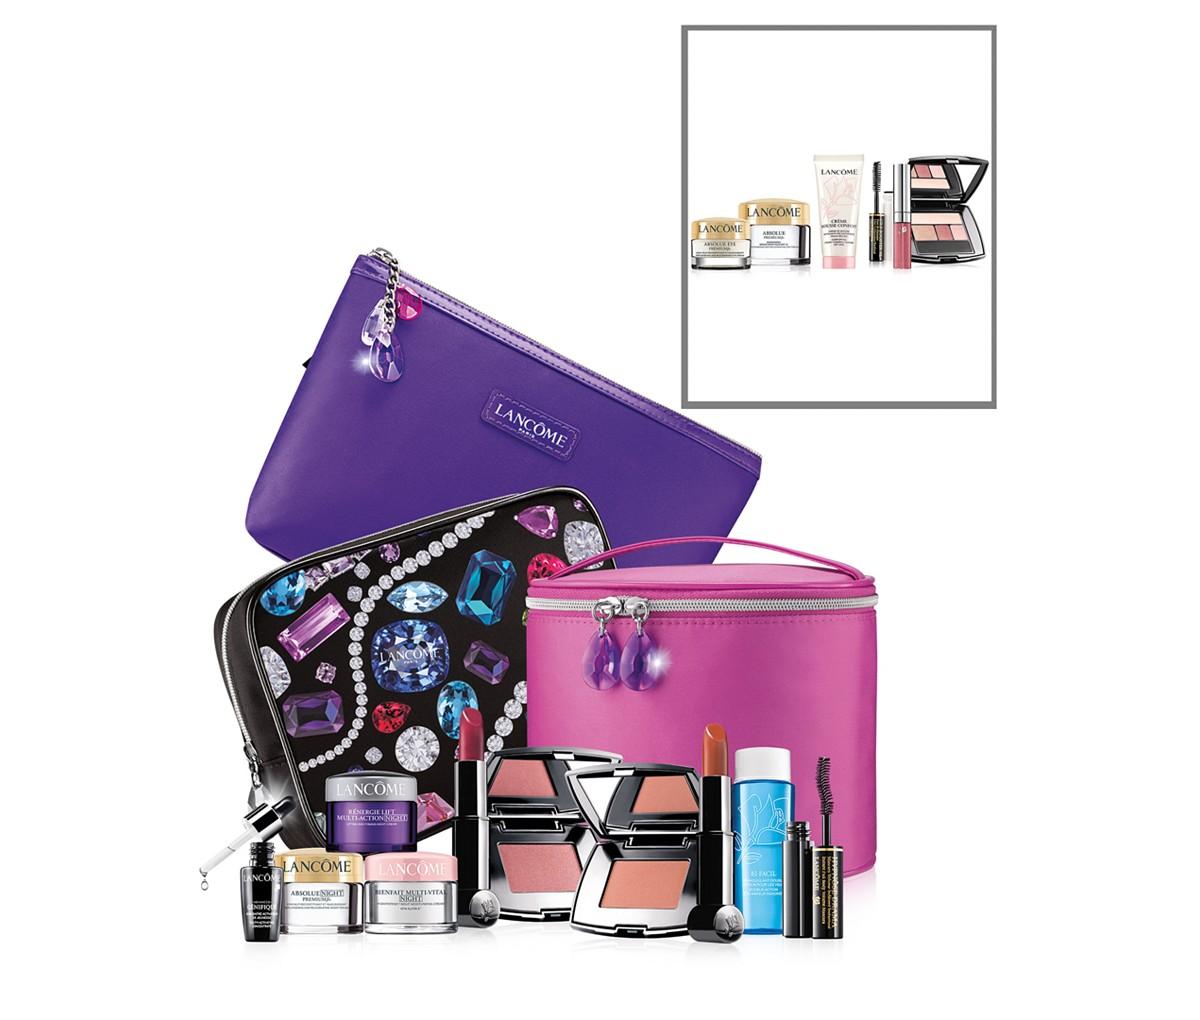 Free gift with purchase. Free Skincare gift with any $75 Lancôme purchase. Free gift with purchase () more like this. Show. 60; ticketfinder.ga, LLC, Folsom St. San Francisco, CA Macy's Credit and Customer Service, PO Box , Mason, Ohio